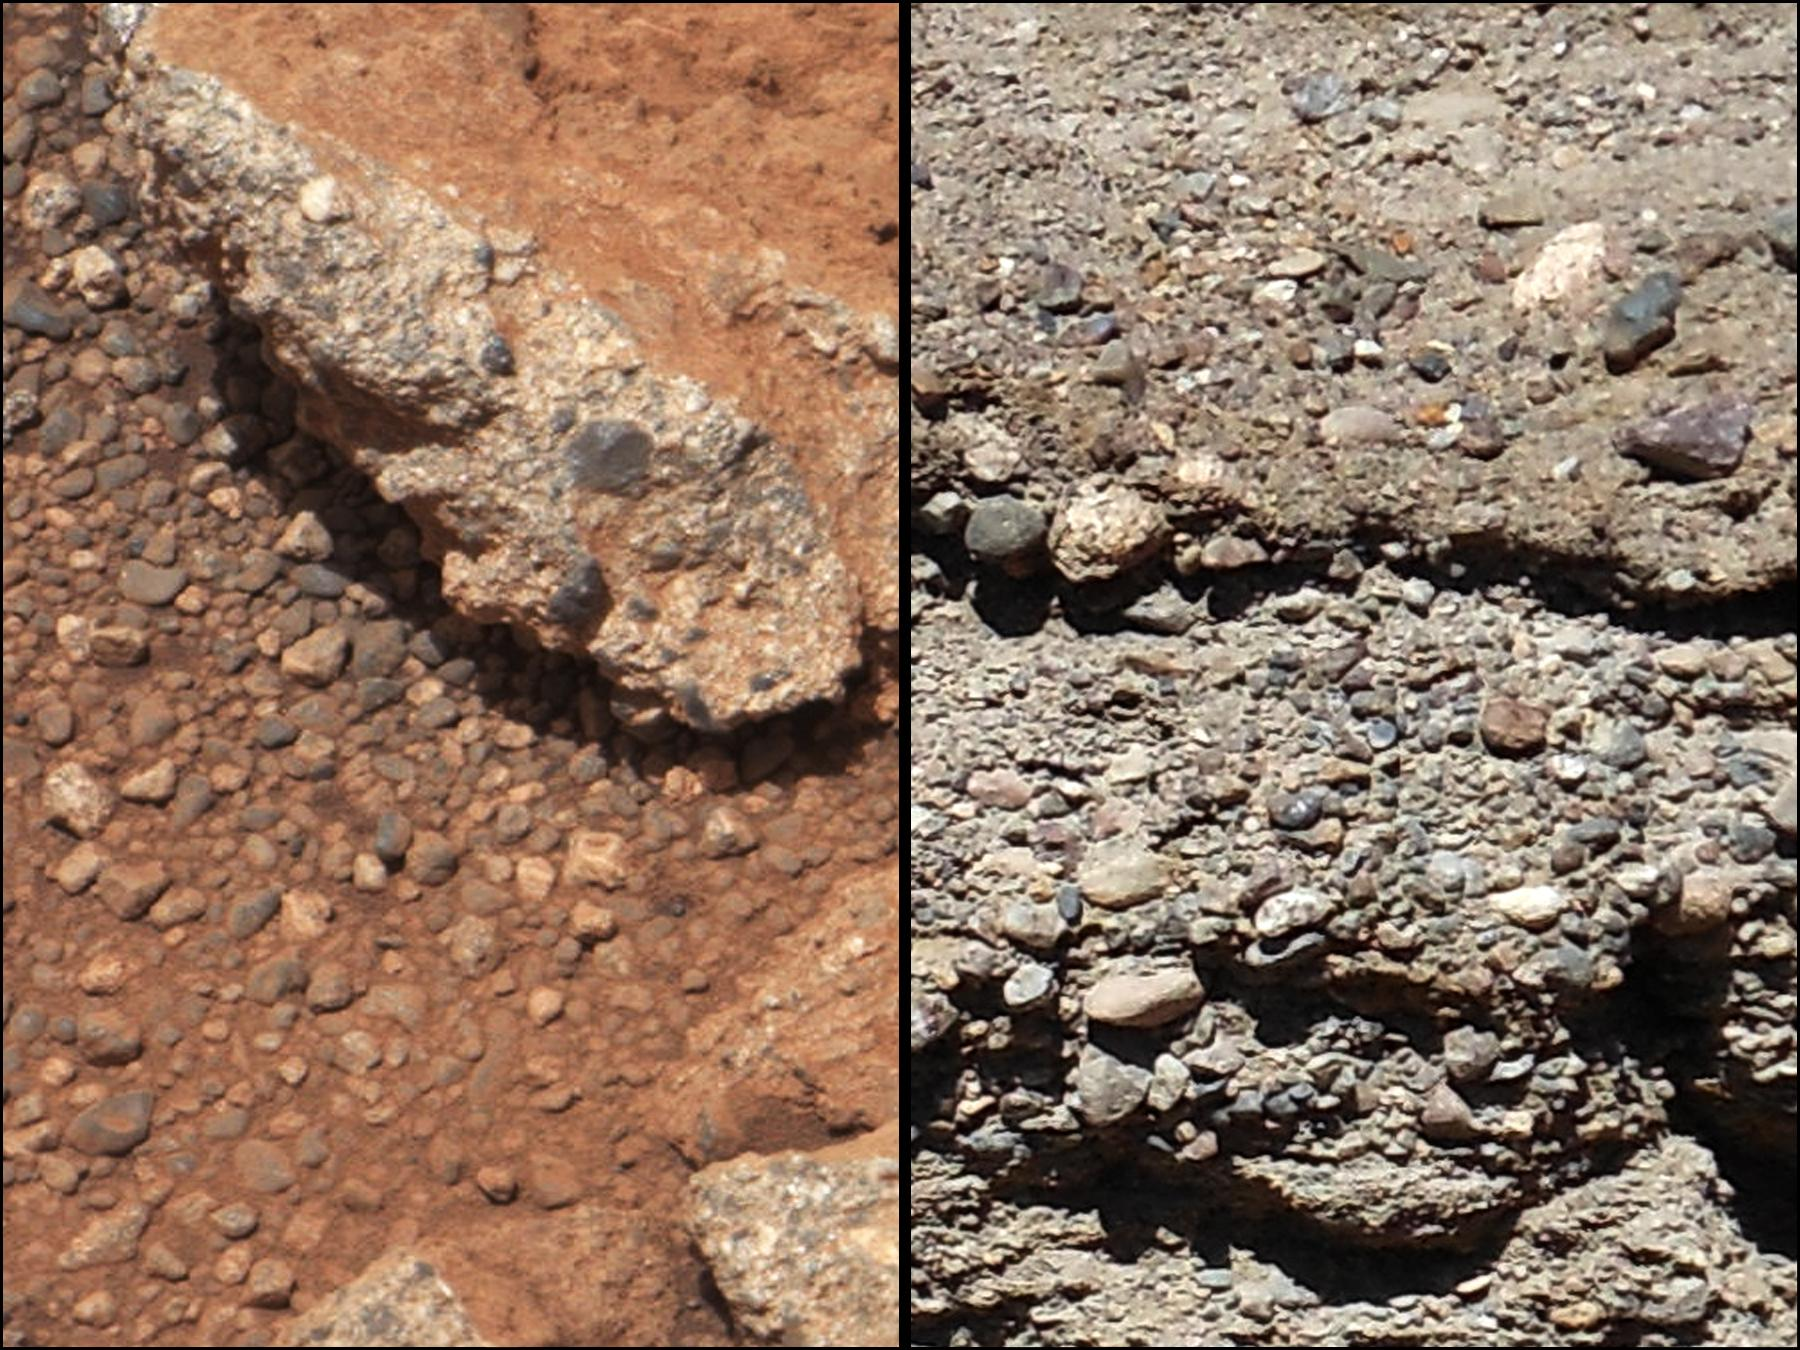 water on mars mars rover - photo #7